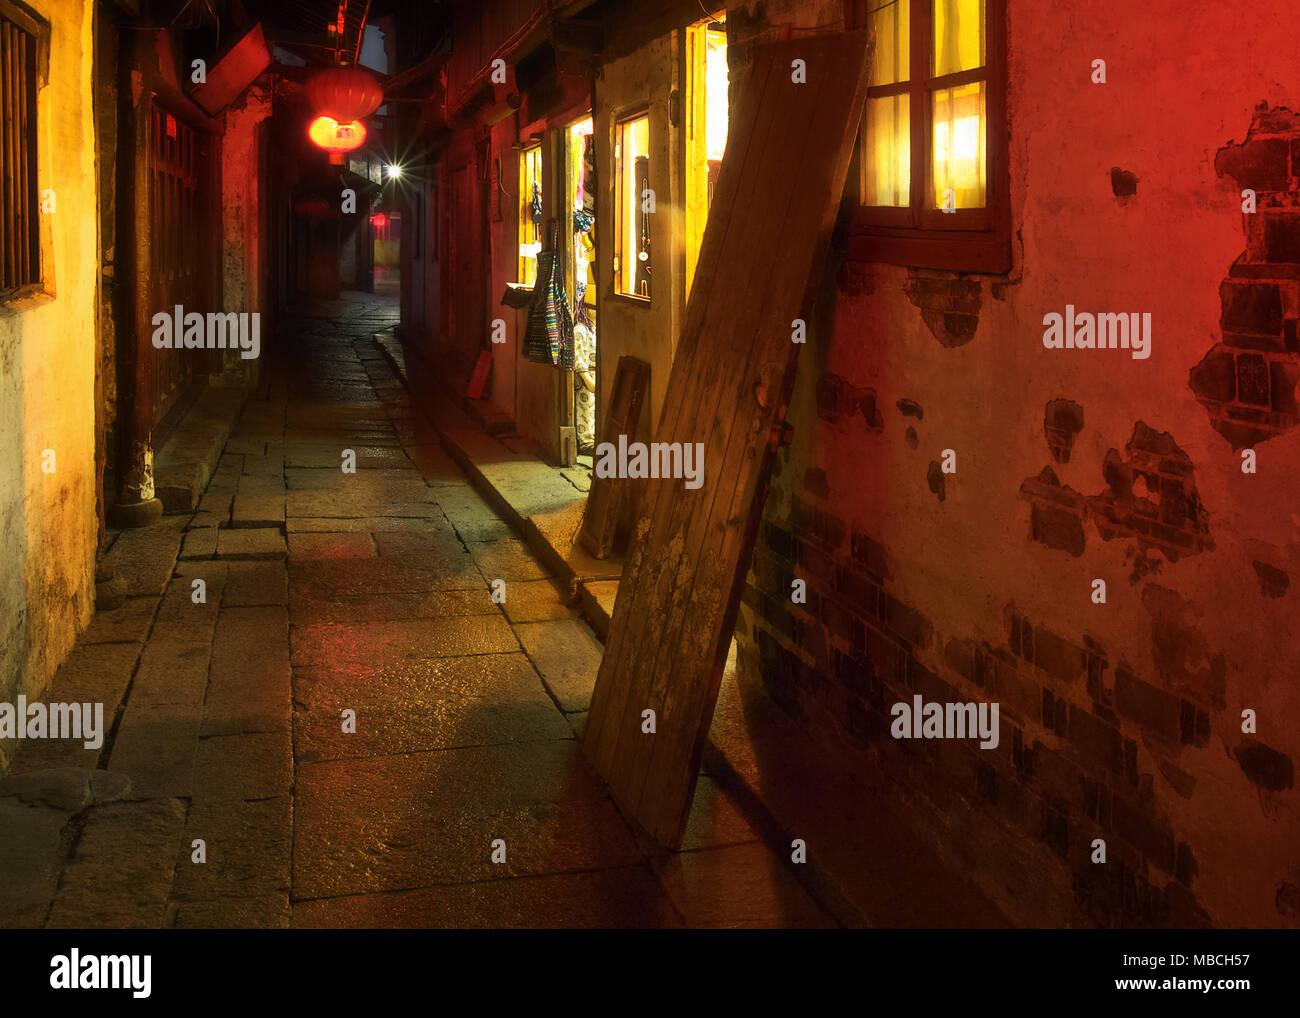 China, Zhouzhuang, 2011 Stock Photo